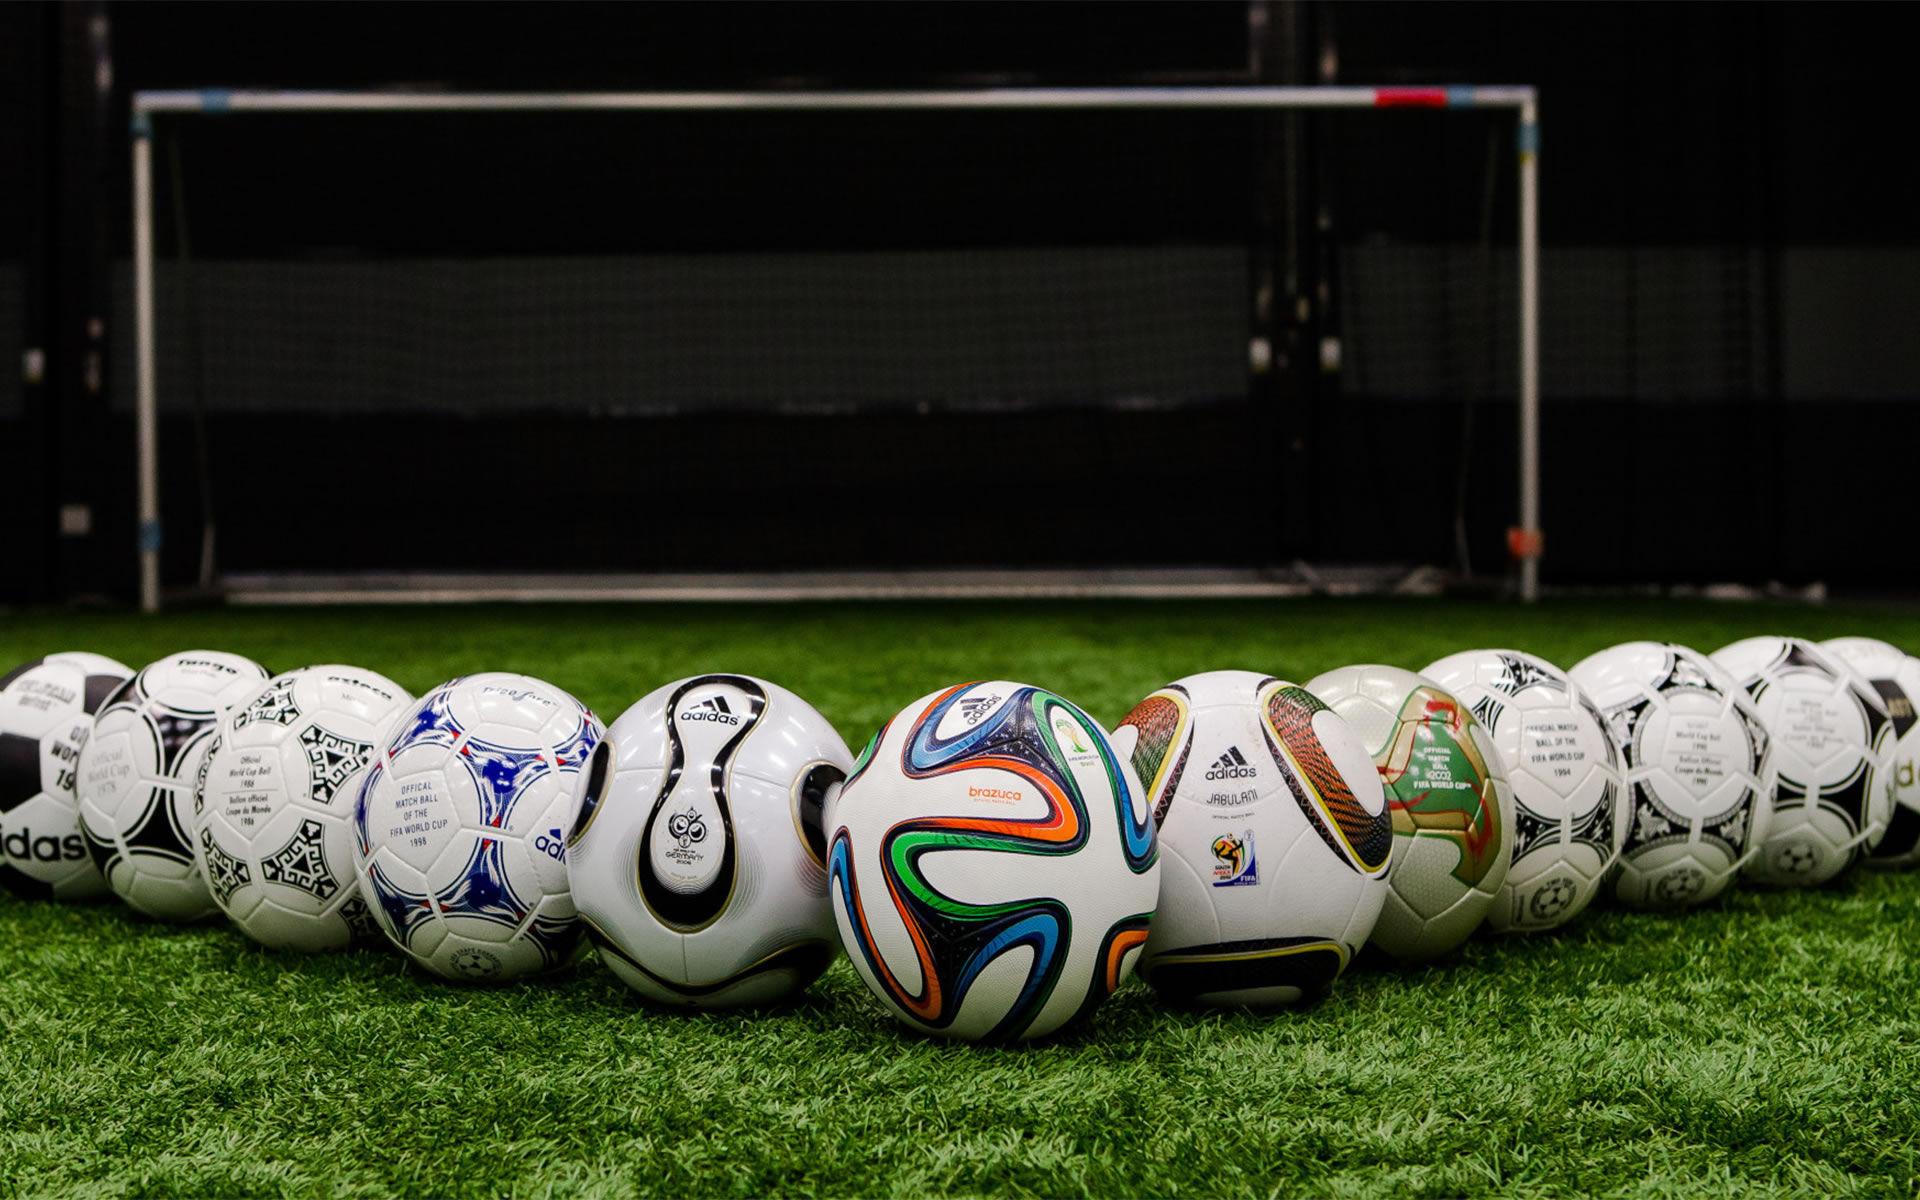 6520 - ¿Sabes de balones de fútbol?